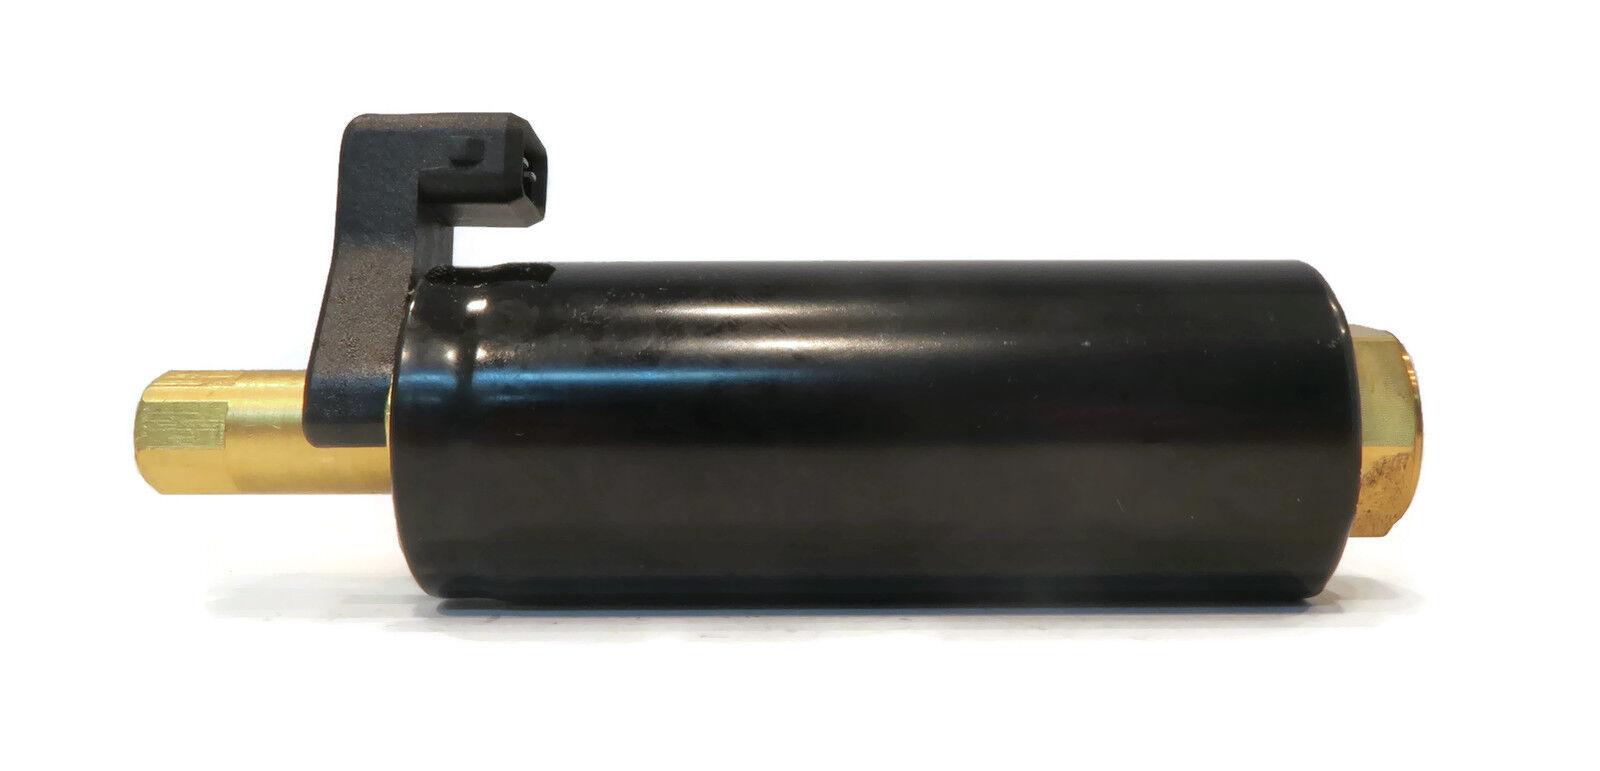 ELECTRIC FUEL PUMP fits 1994  351 5.8L High Pressure for MFI Volvo Penta Engine